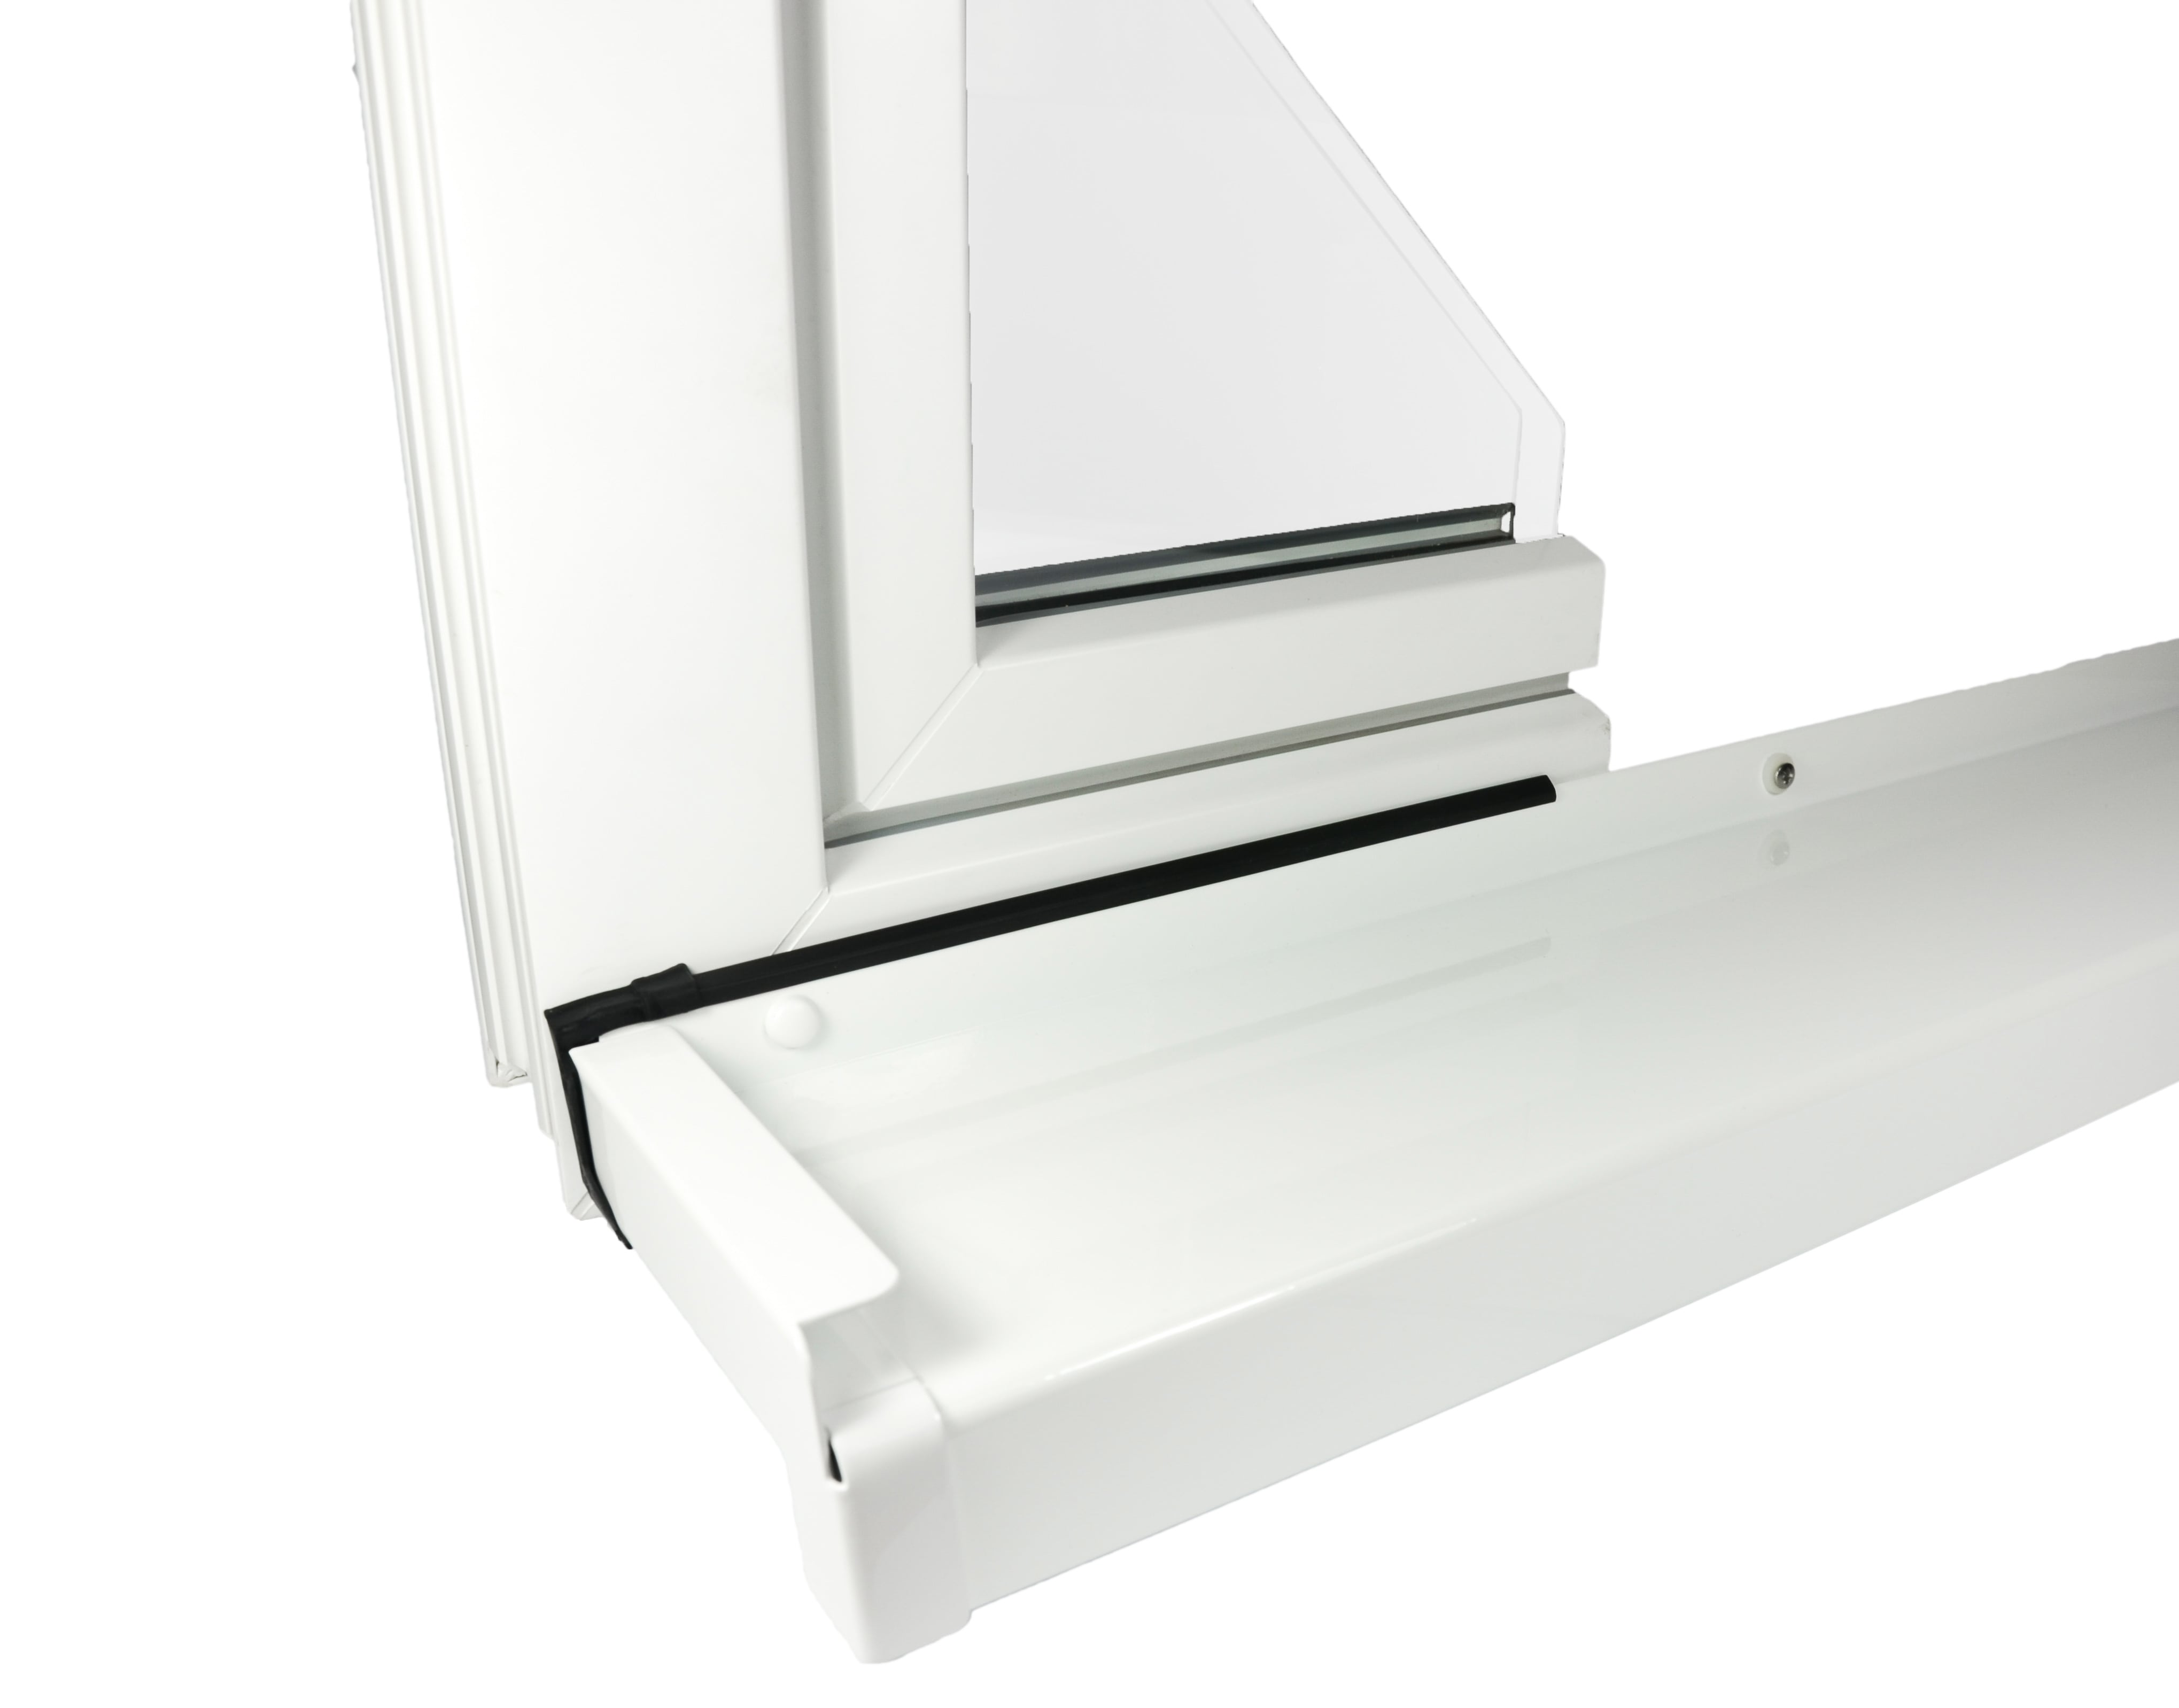 aluminium fensterbank wei ral 9016 aluminium fensterb nke au en wir liefern deine